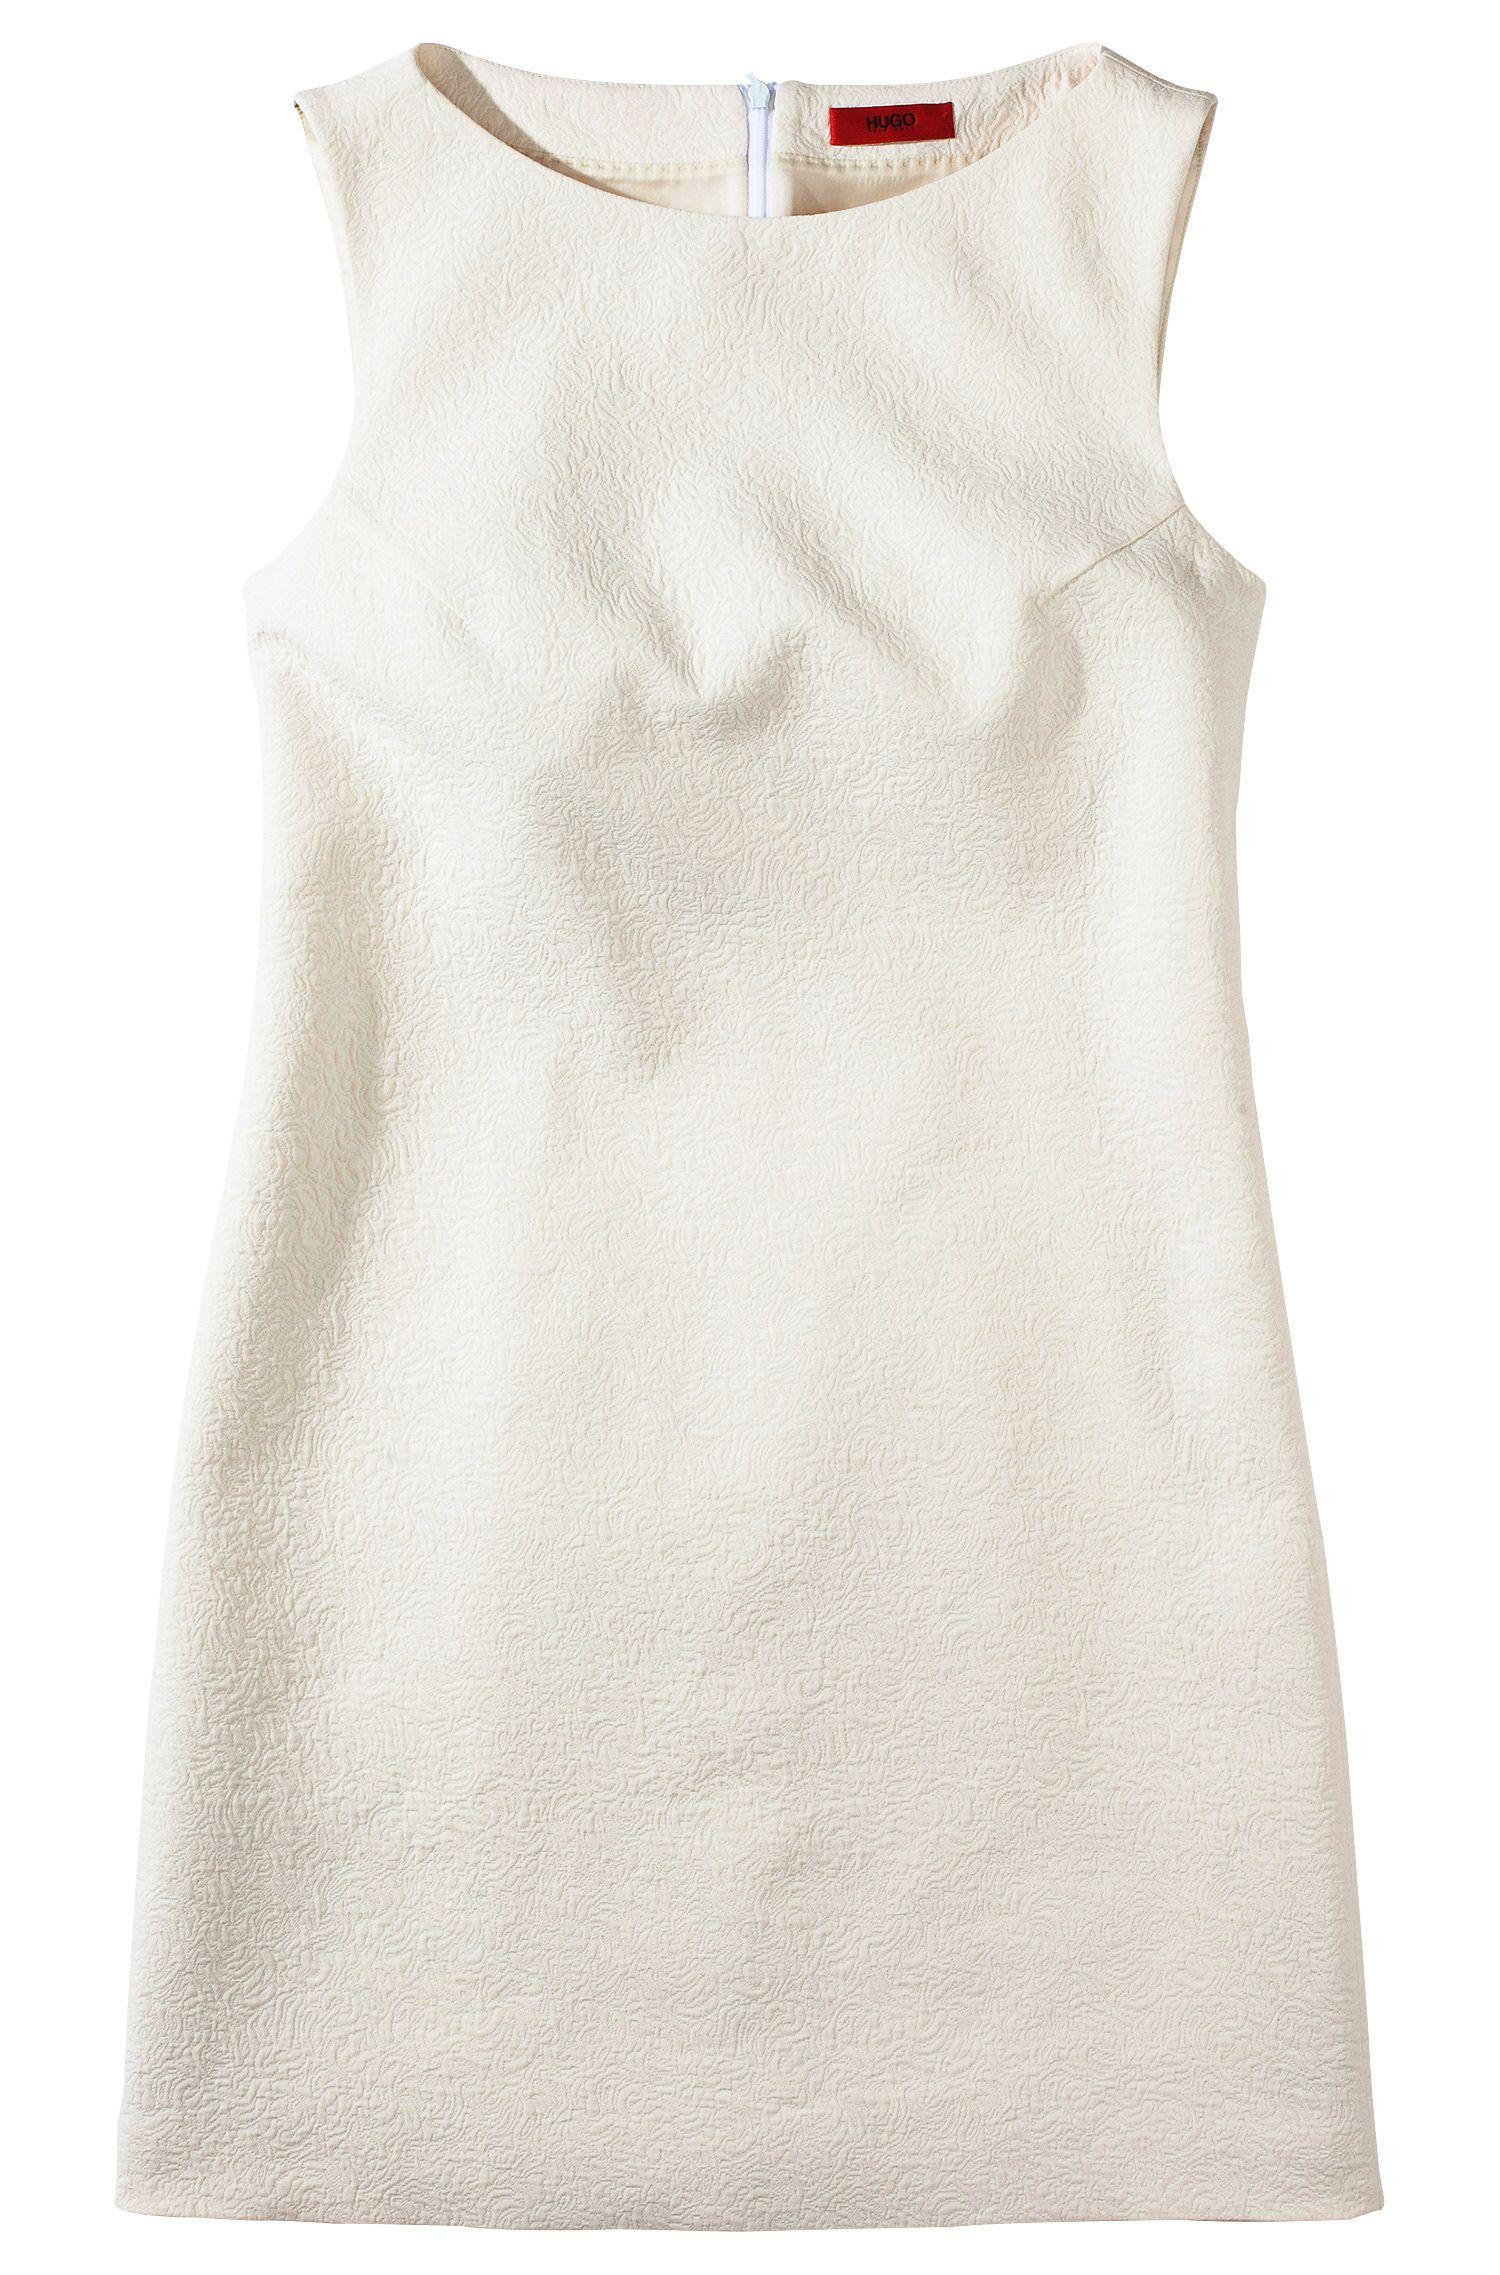 Robe en coton, Katisa-1